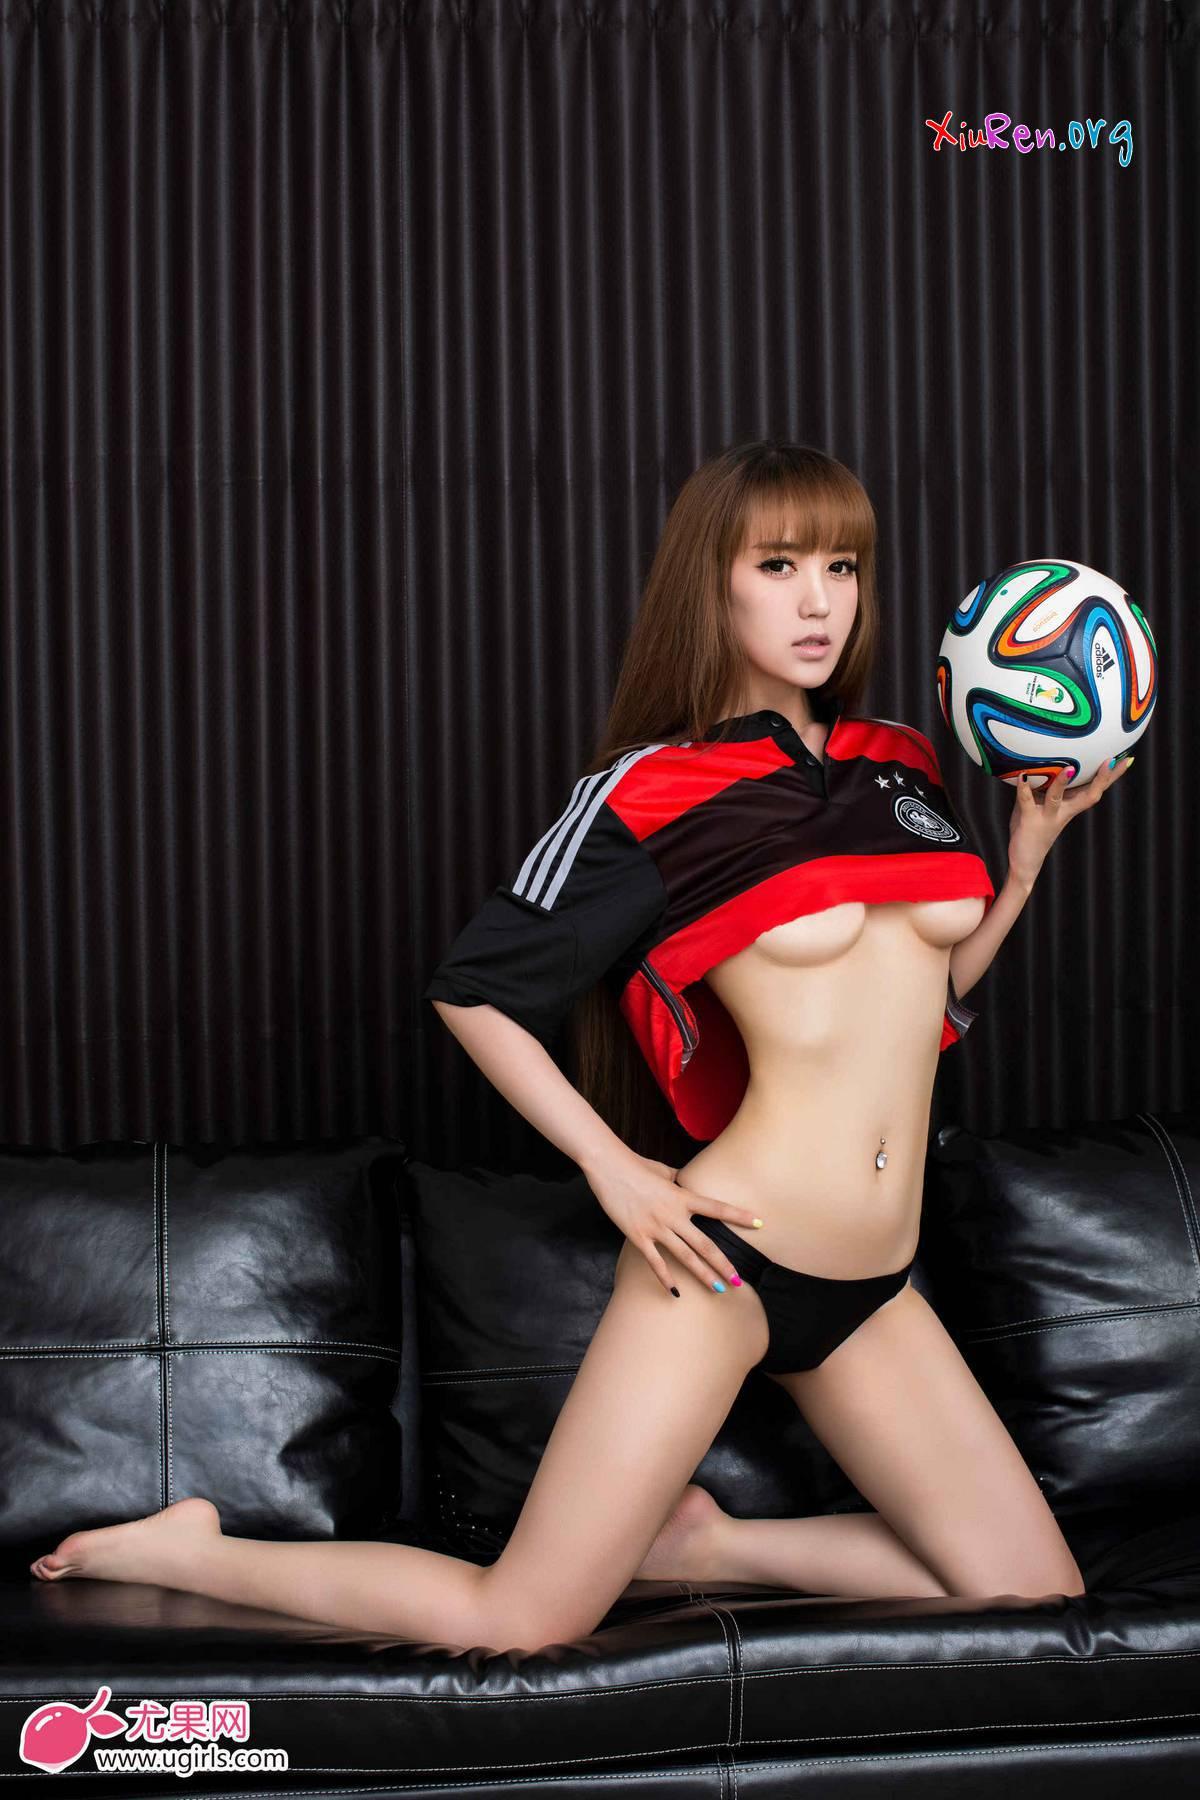 ugirls-2014-world-cup-0021.jpg